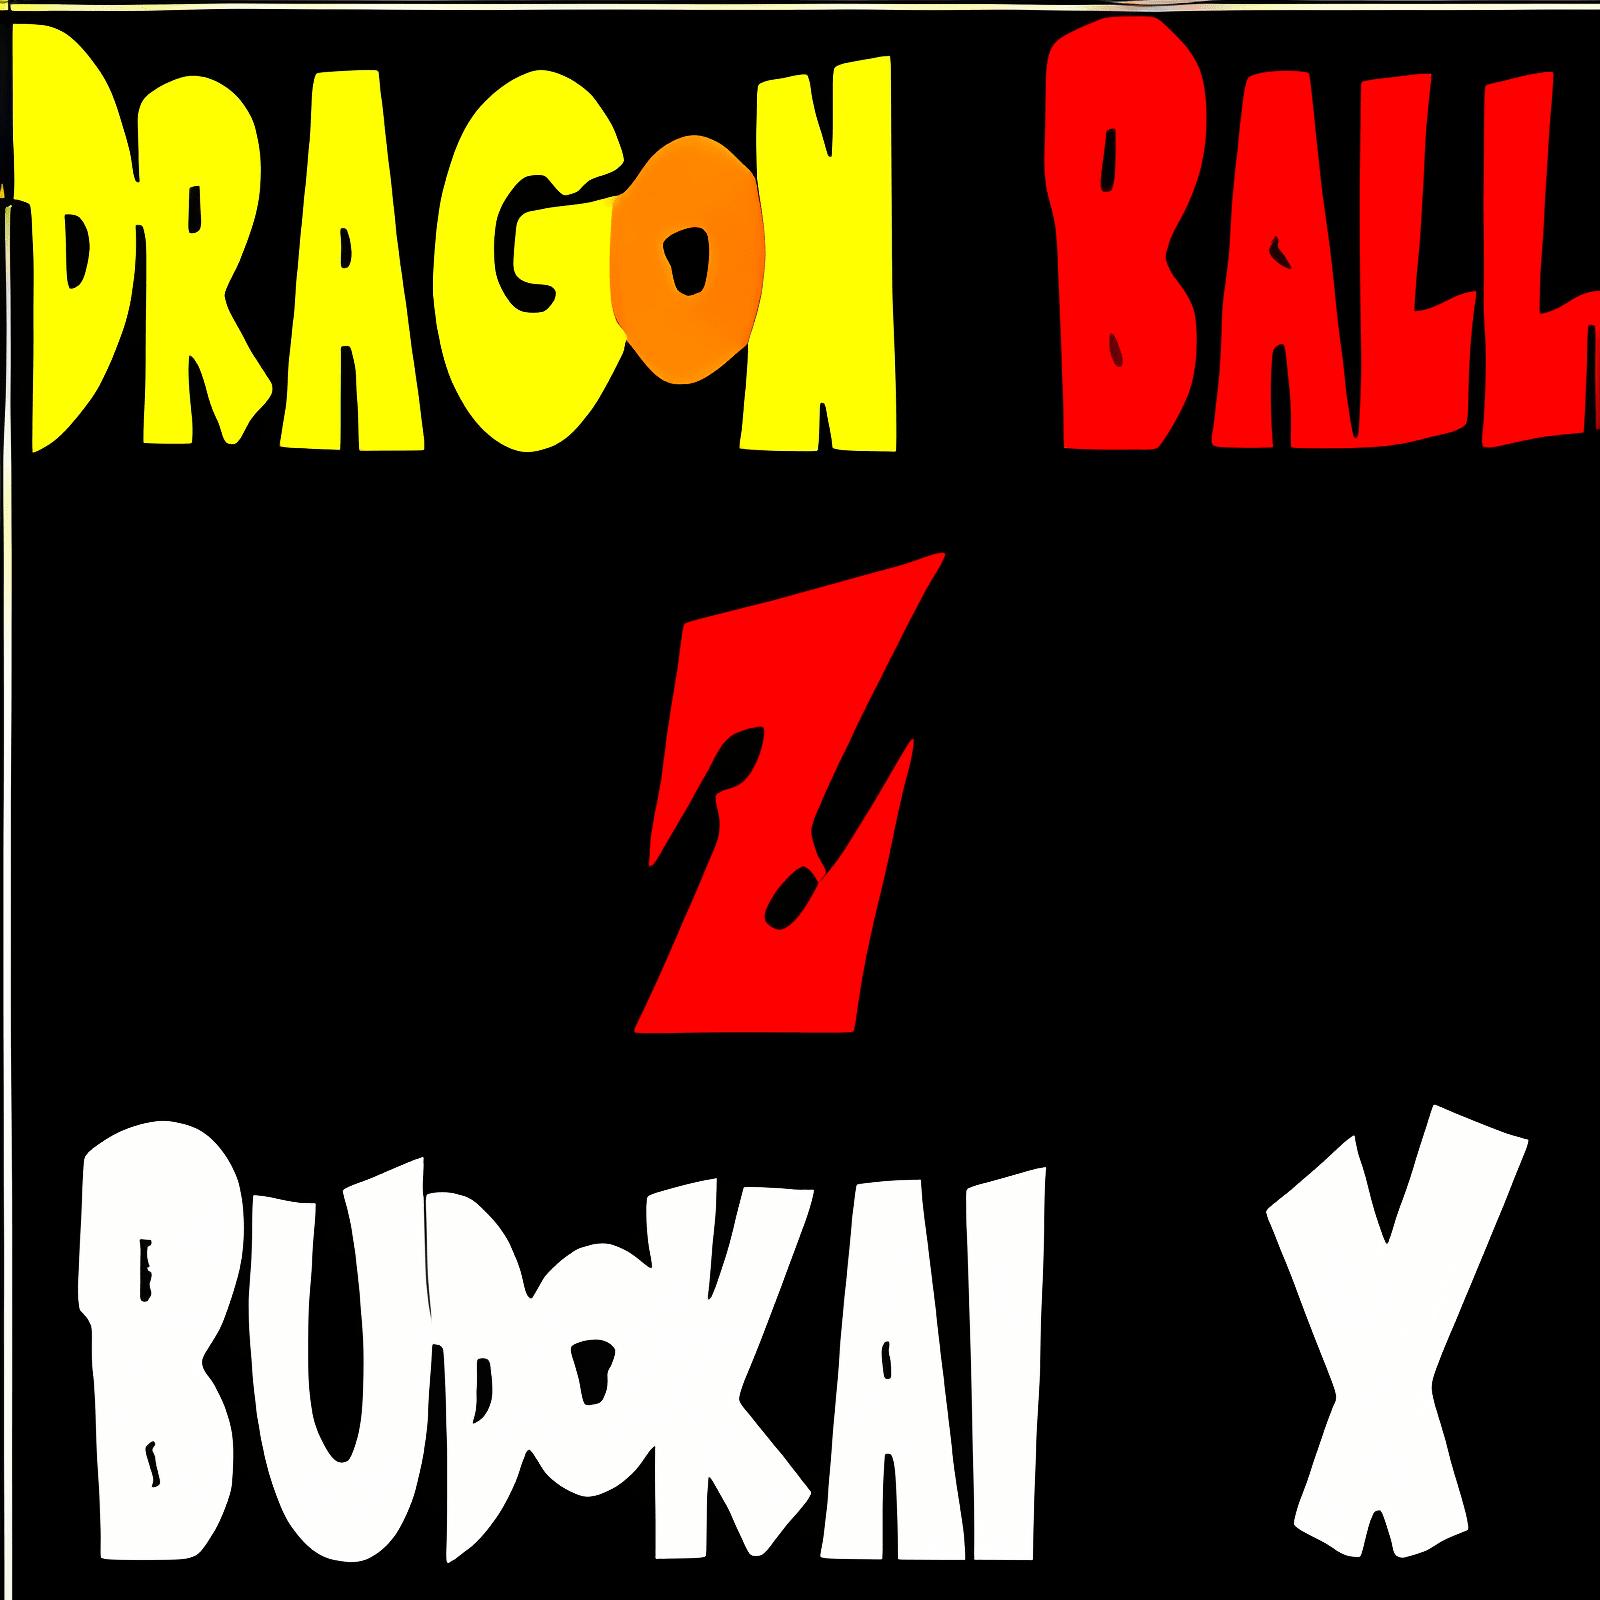 Dragon Ball Z Budokai X 2.0